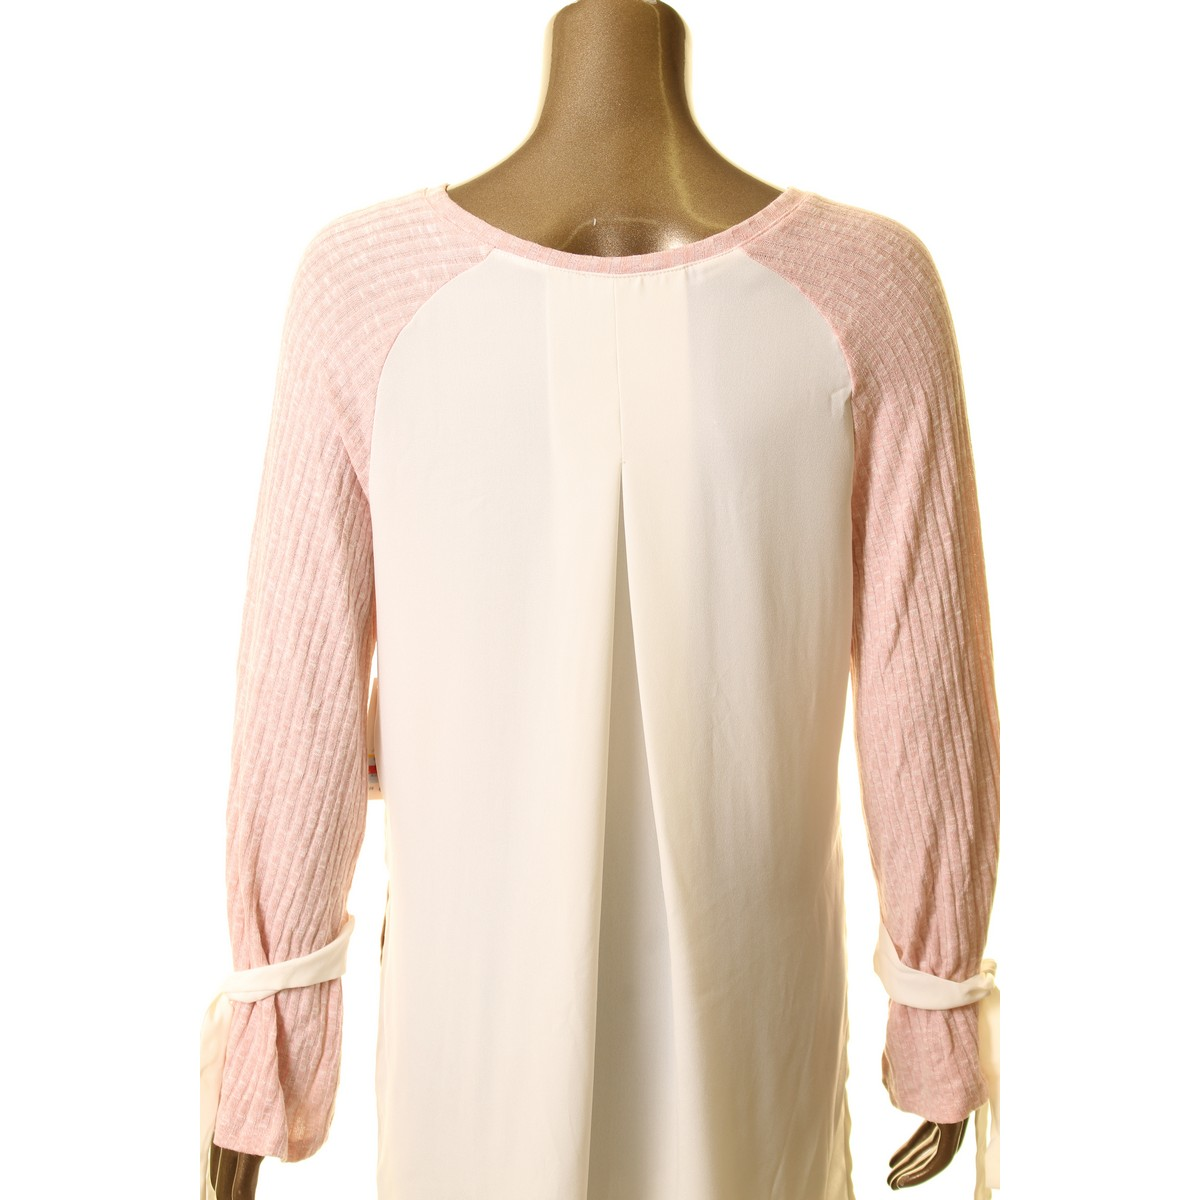 KENSIE-NEW-Women-039-s-Tie-Sleeve-Ribbed-Chiffon-Back-Knit-Shirt-Top-TEDO thumbnail 8